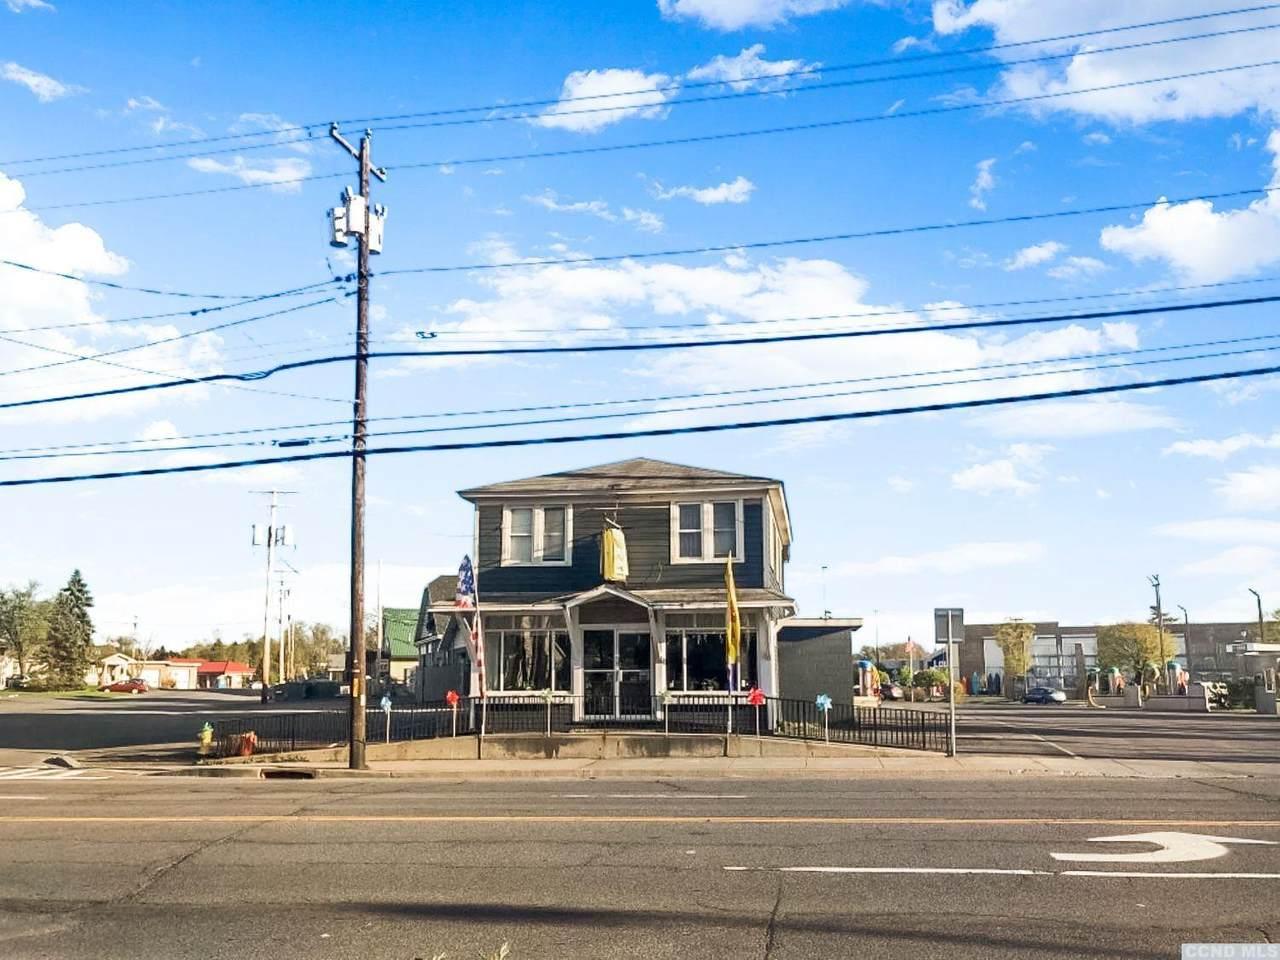 261 West Bridge St - Photo 1